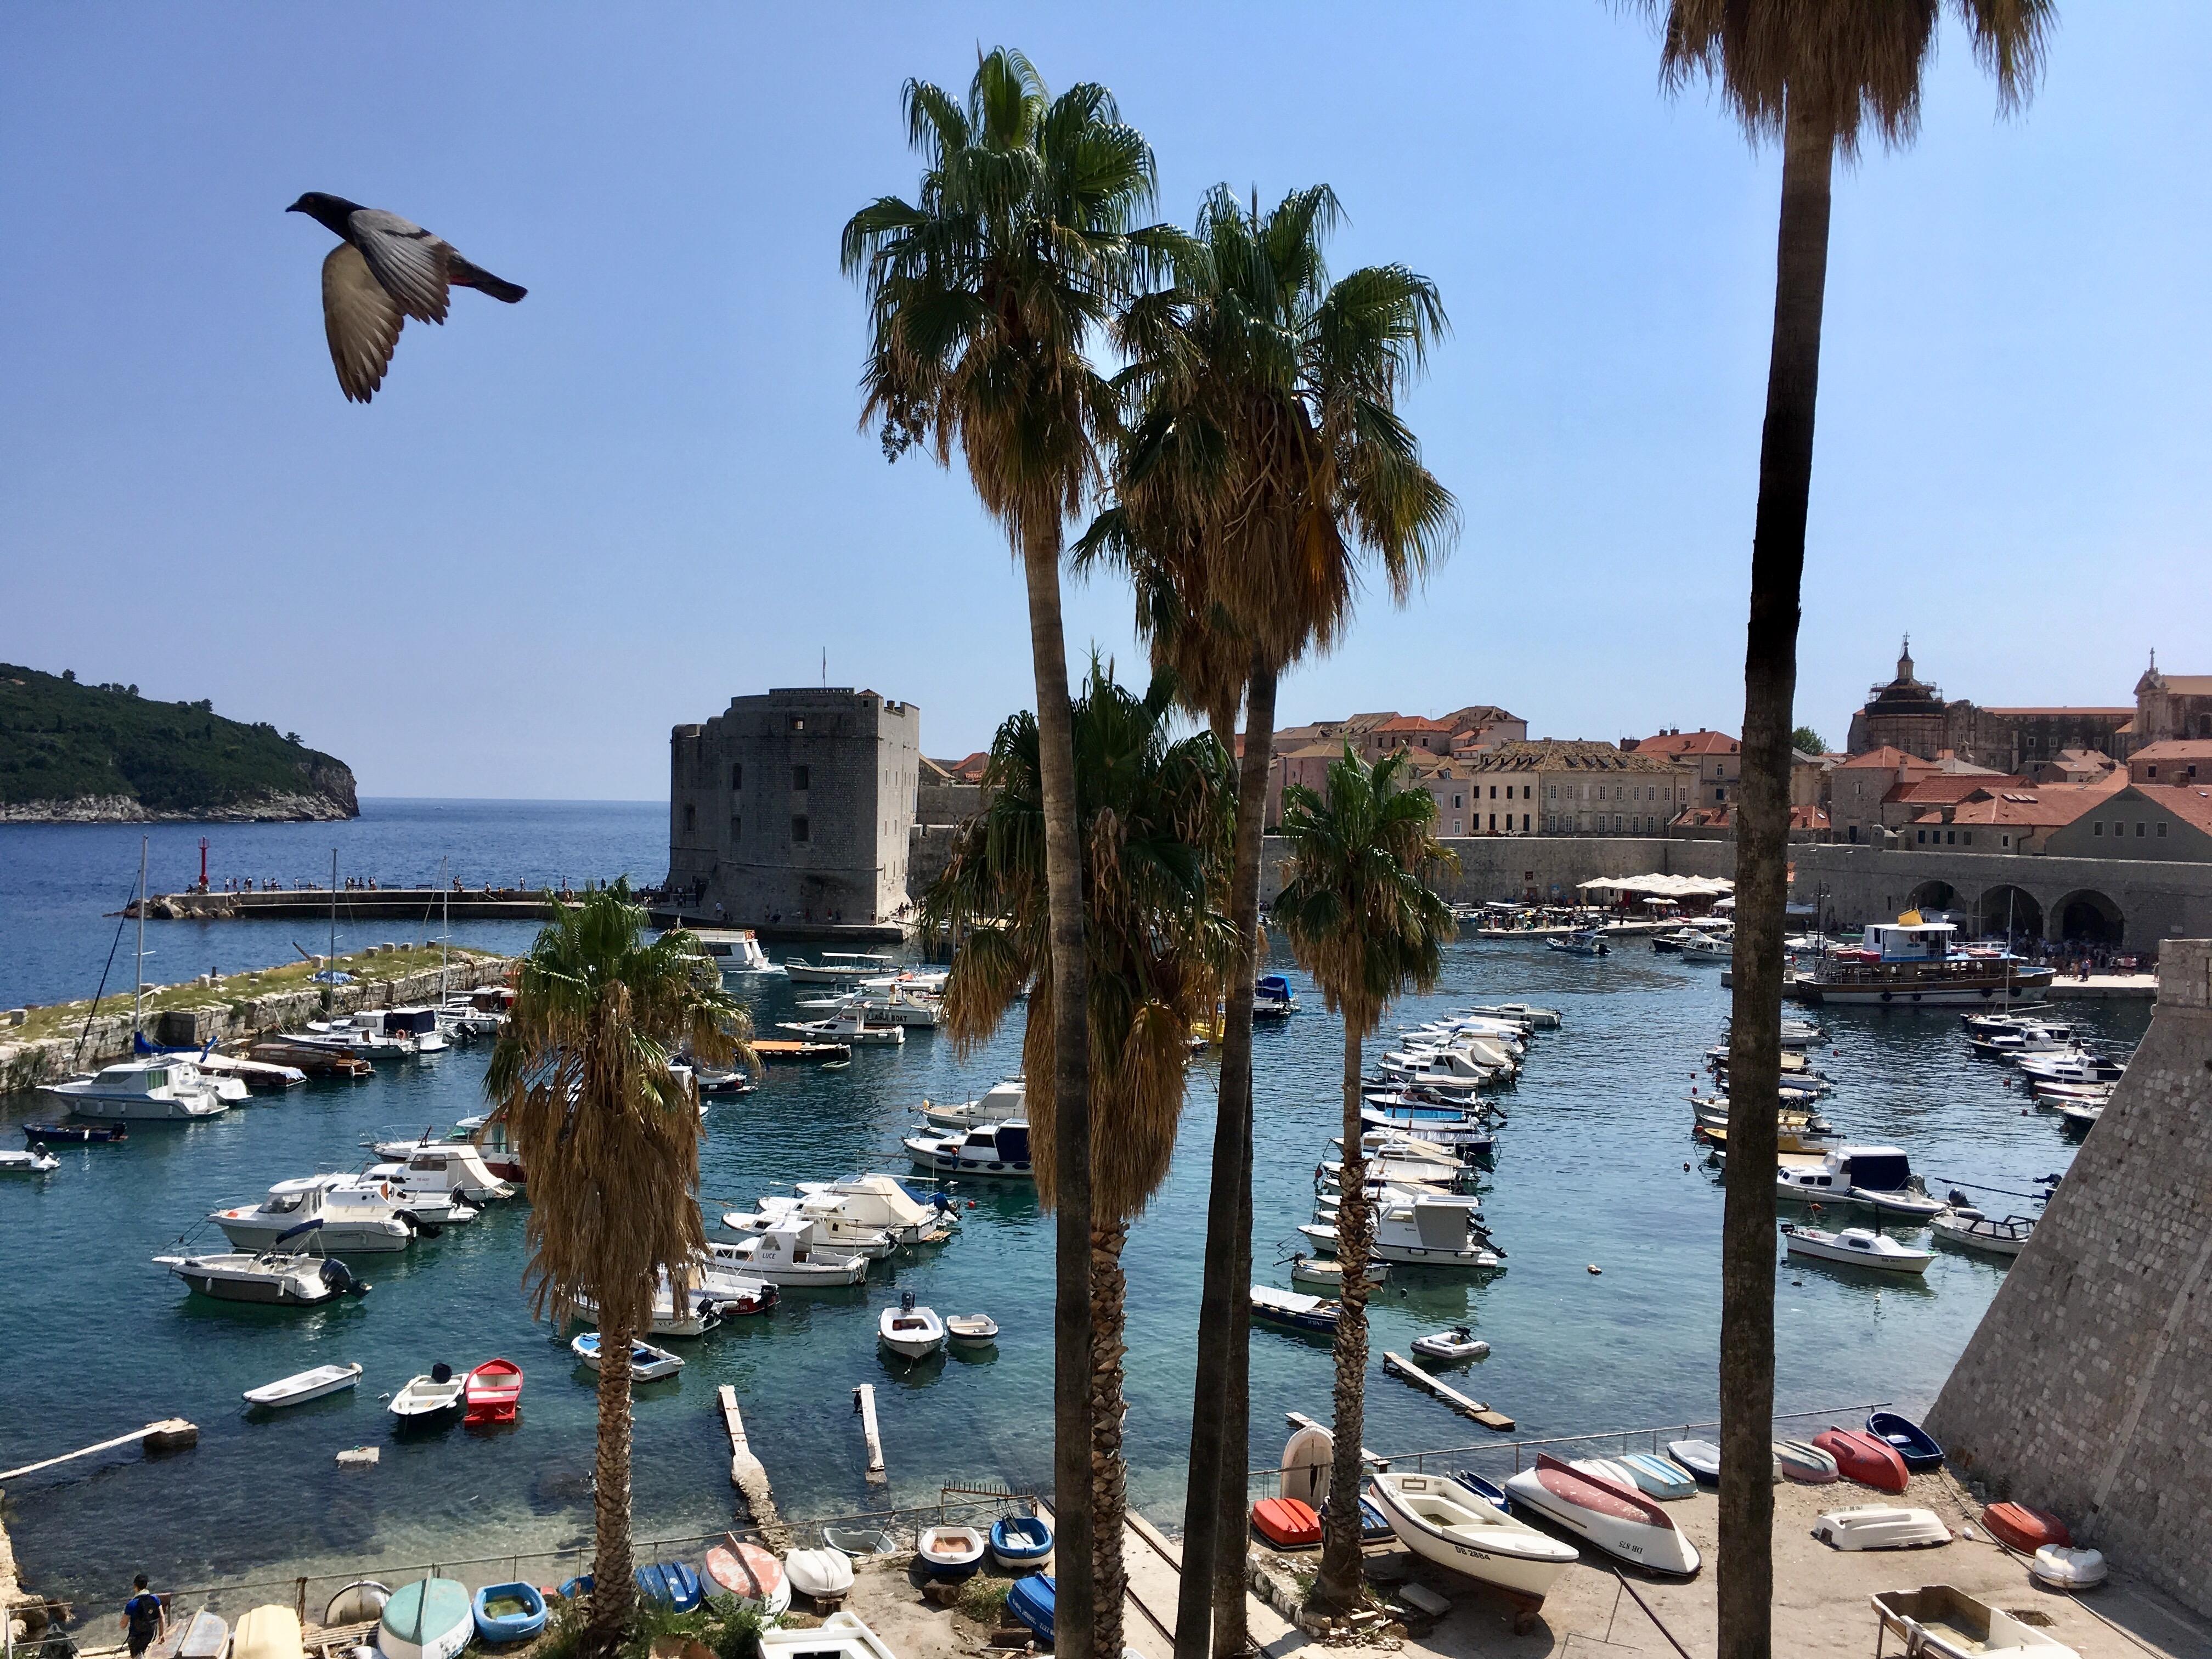 Croatia, old town Dubrovnik